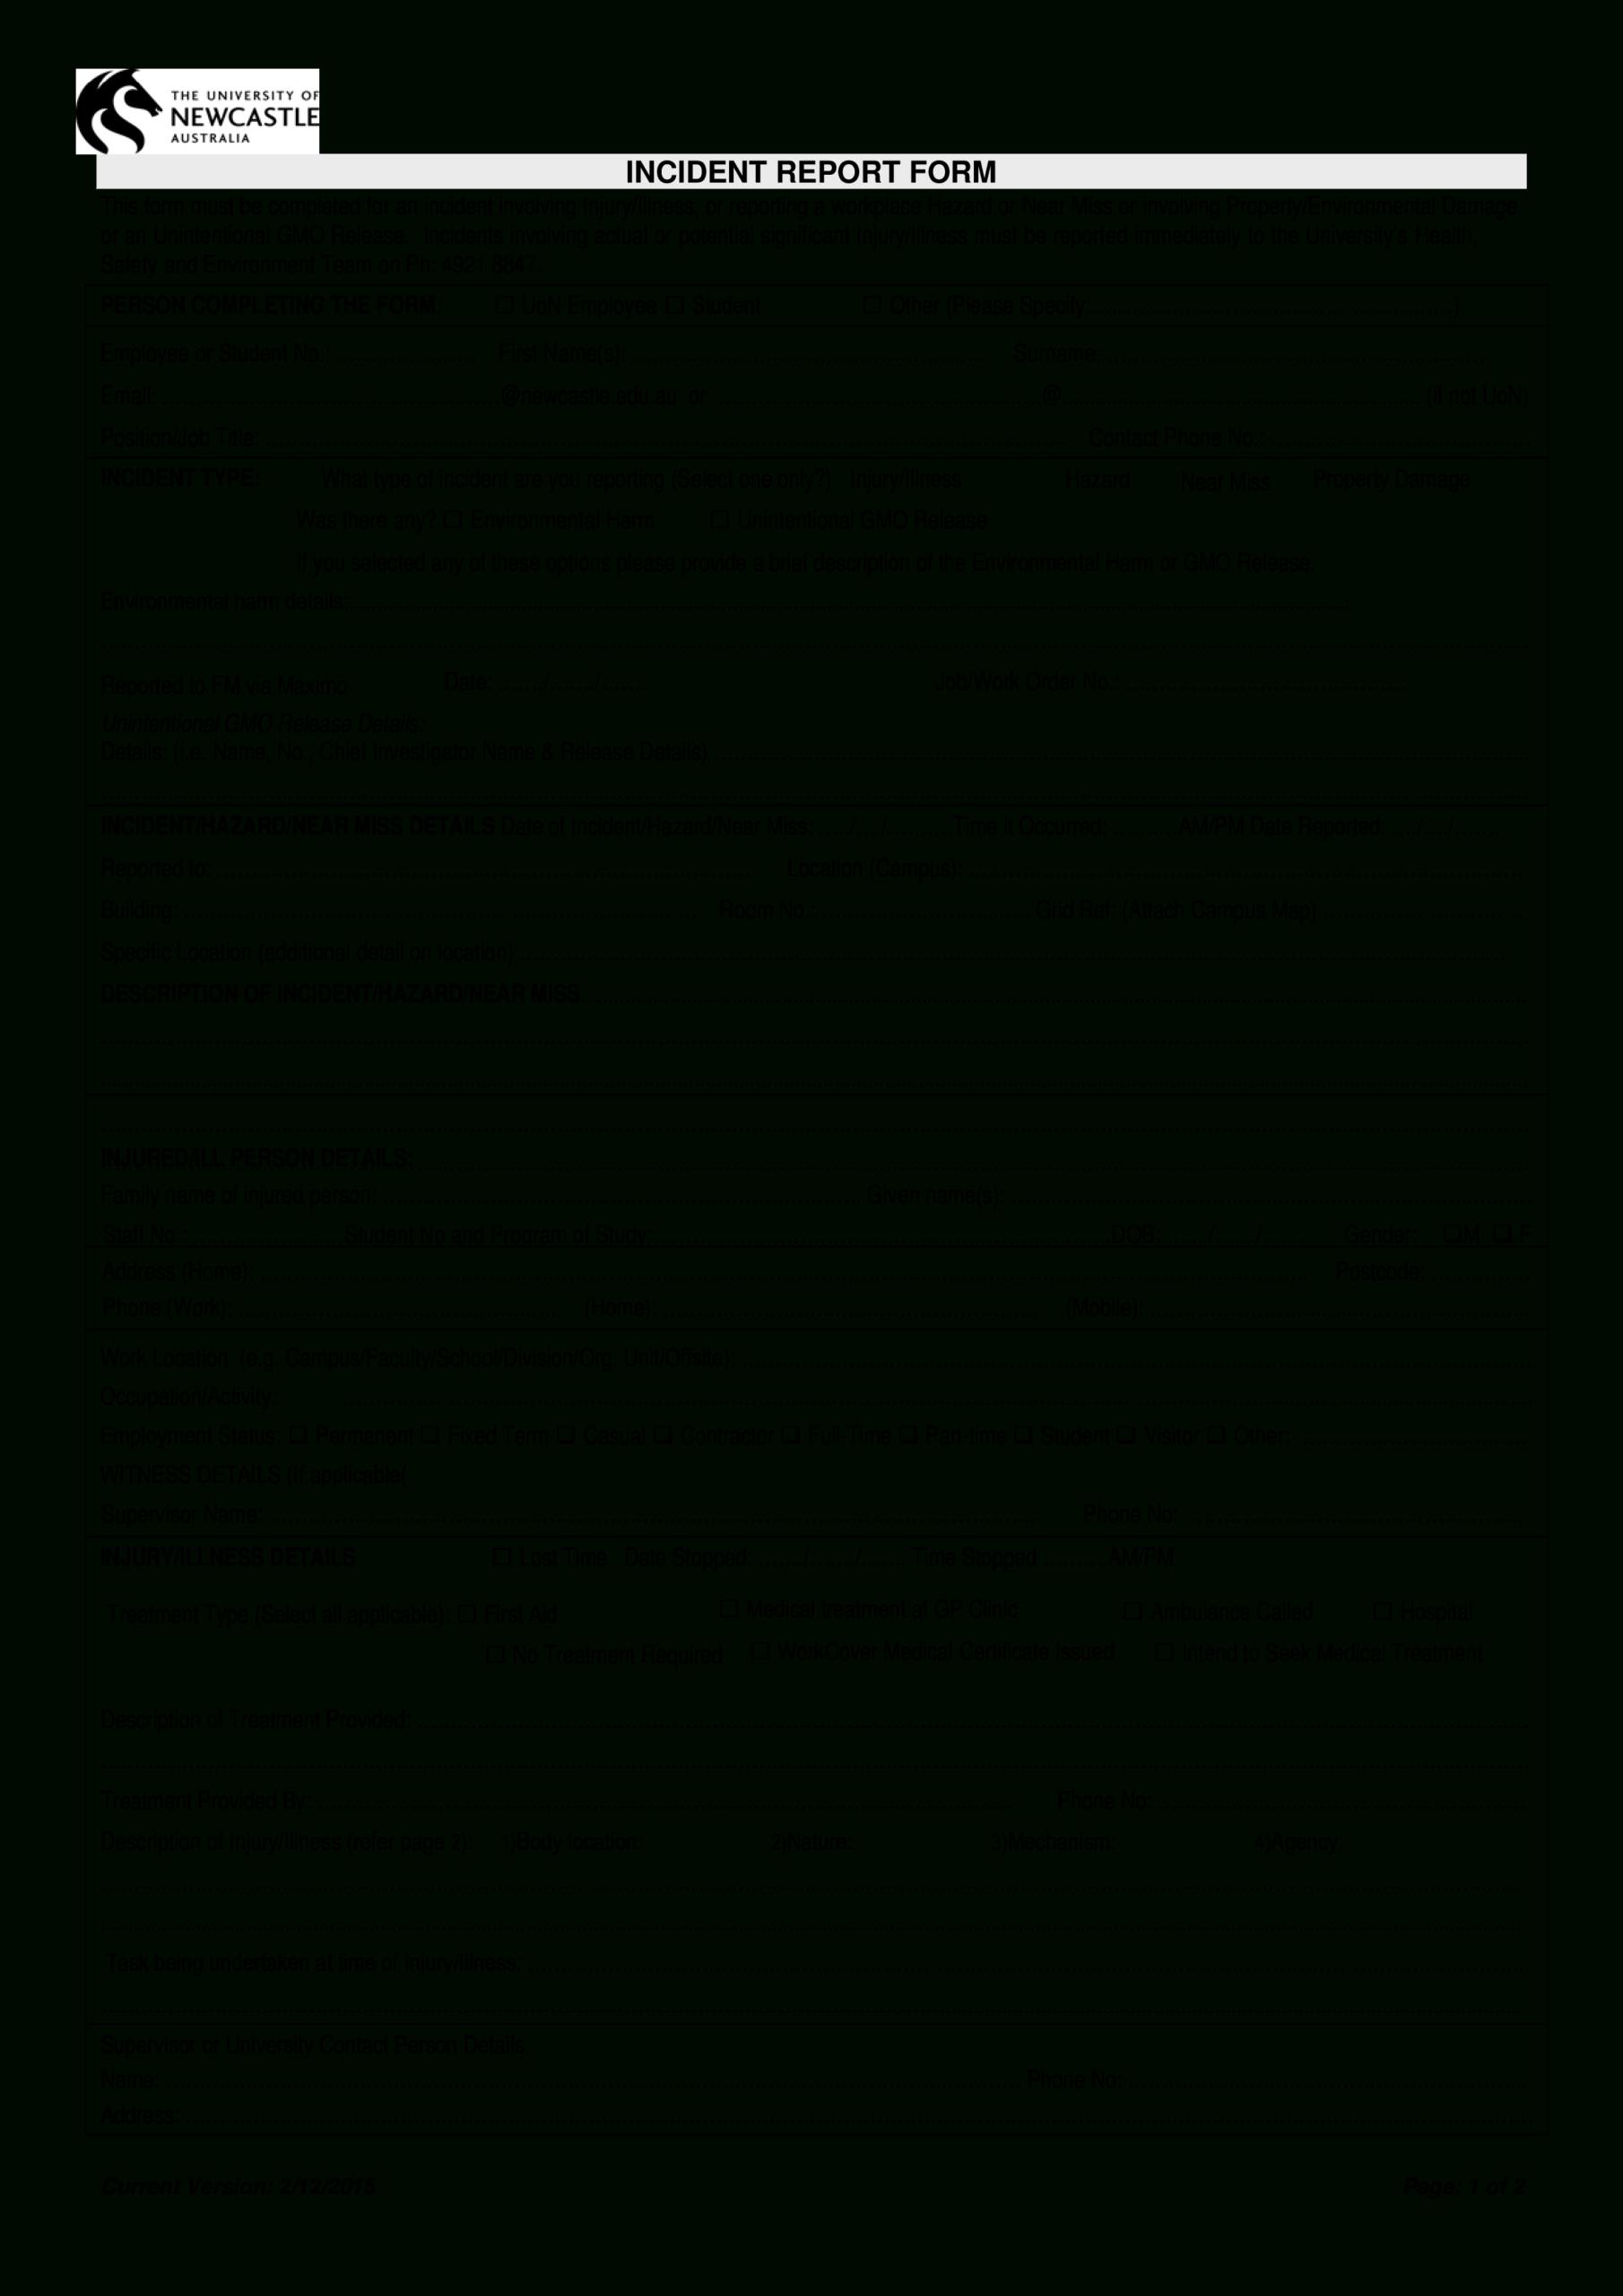 Hazard Incident Report Form | Templates At Regarding Hazard Incident Report Form Template